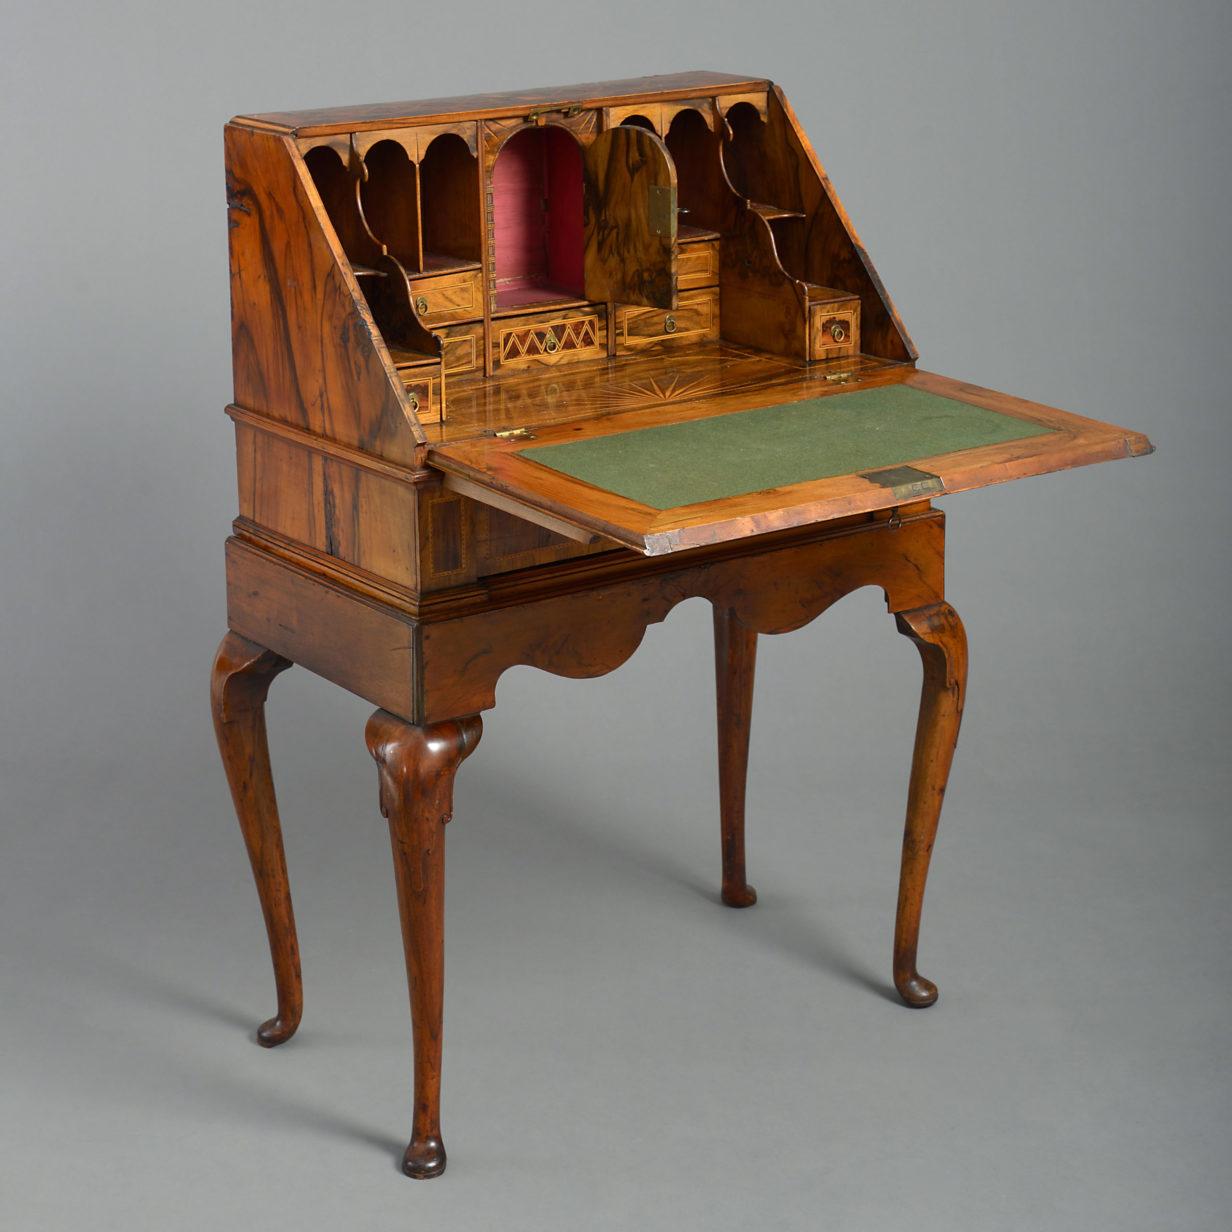 A Parquetry Bureau